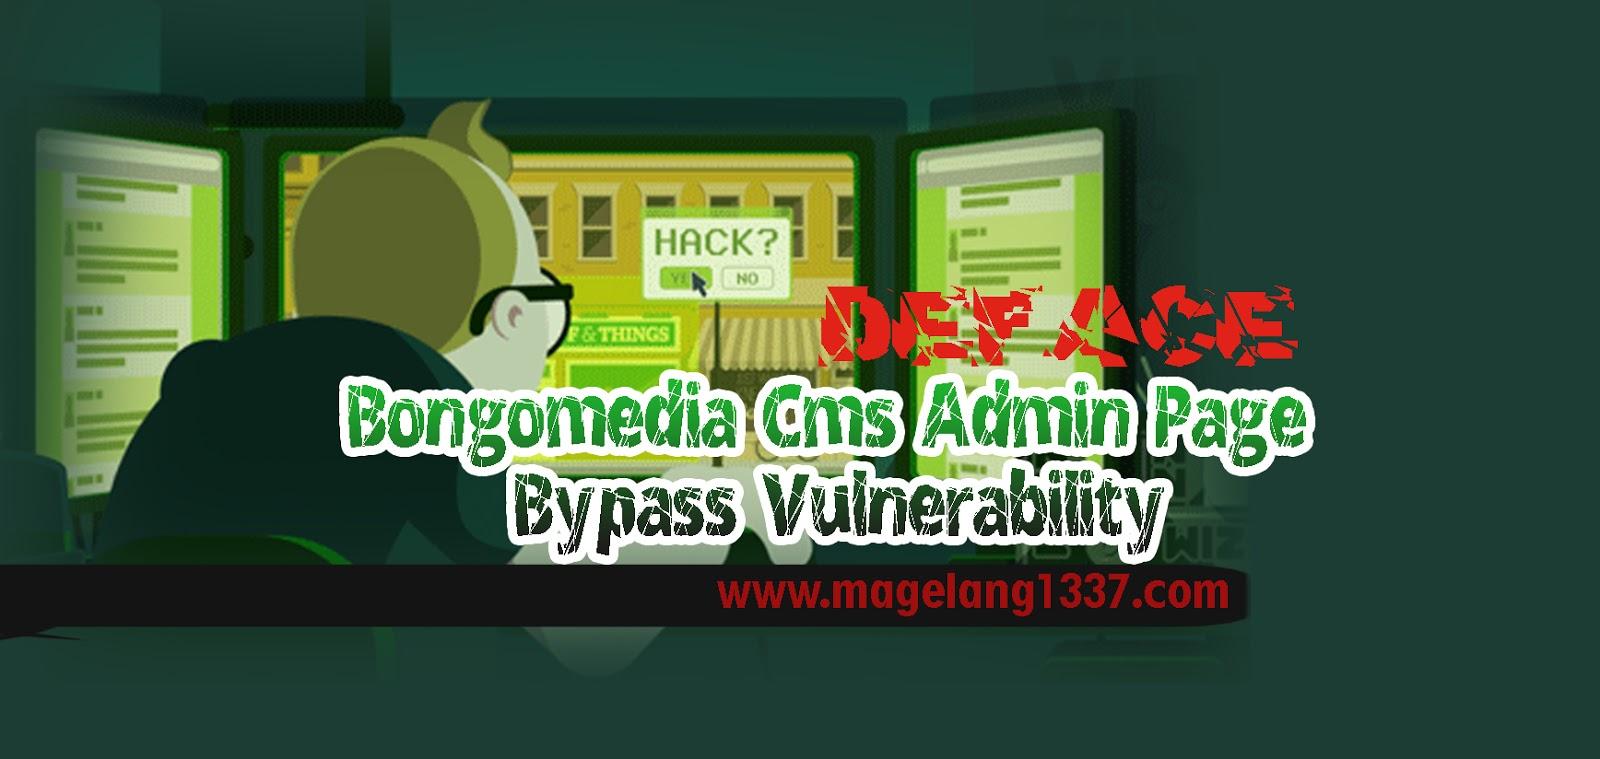 Bongomedia Cms Admin Page Bypass Vulnerability - MNH-BLOG